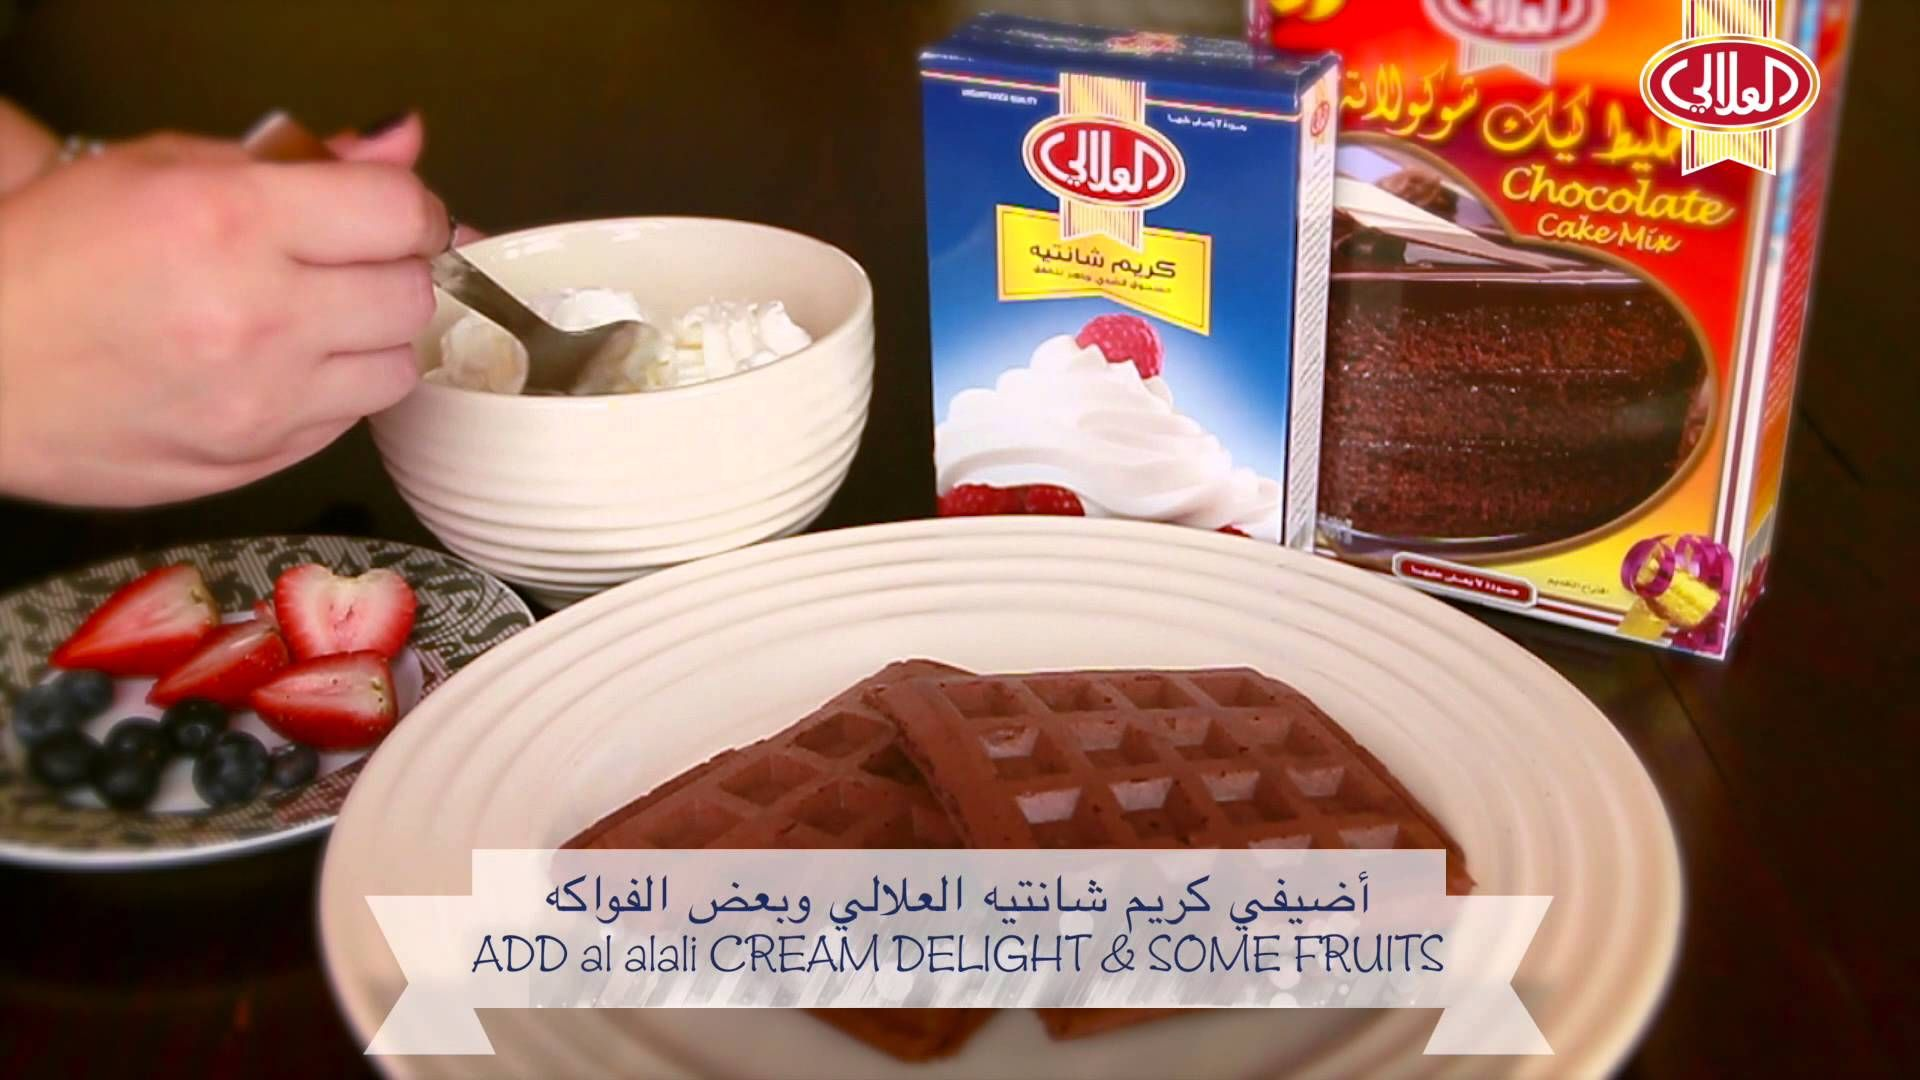 Scrumptious Waffles With Cake Mix الوافل الشهي بإستخدام خليط الكيك Food Waffles Chocolate Cake